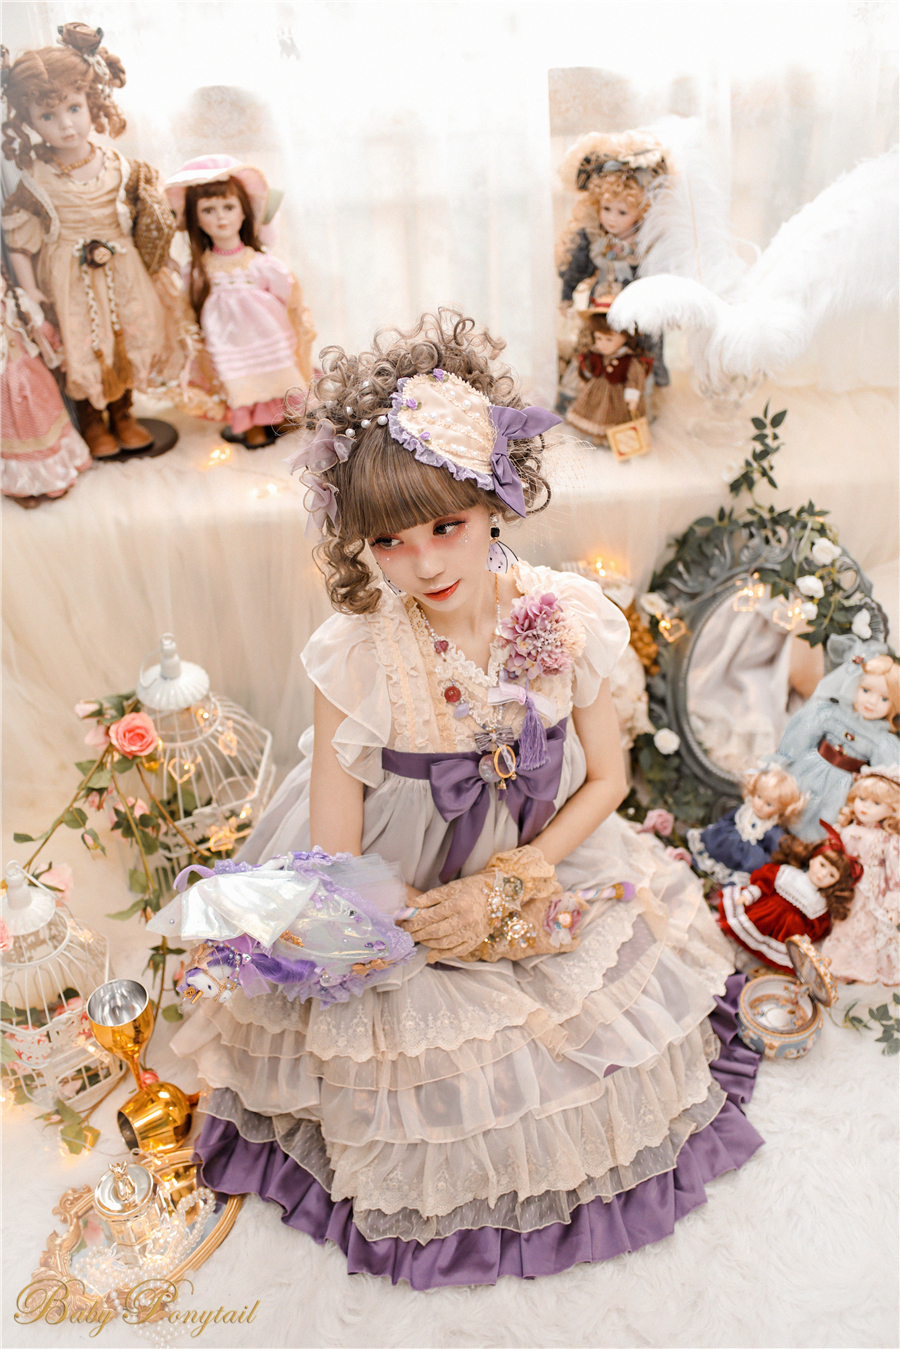 Babyponytail_Model Photo_Present Angel_JSK Violet_2_Kaka_06.jpg